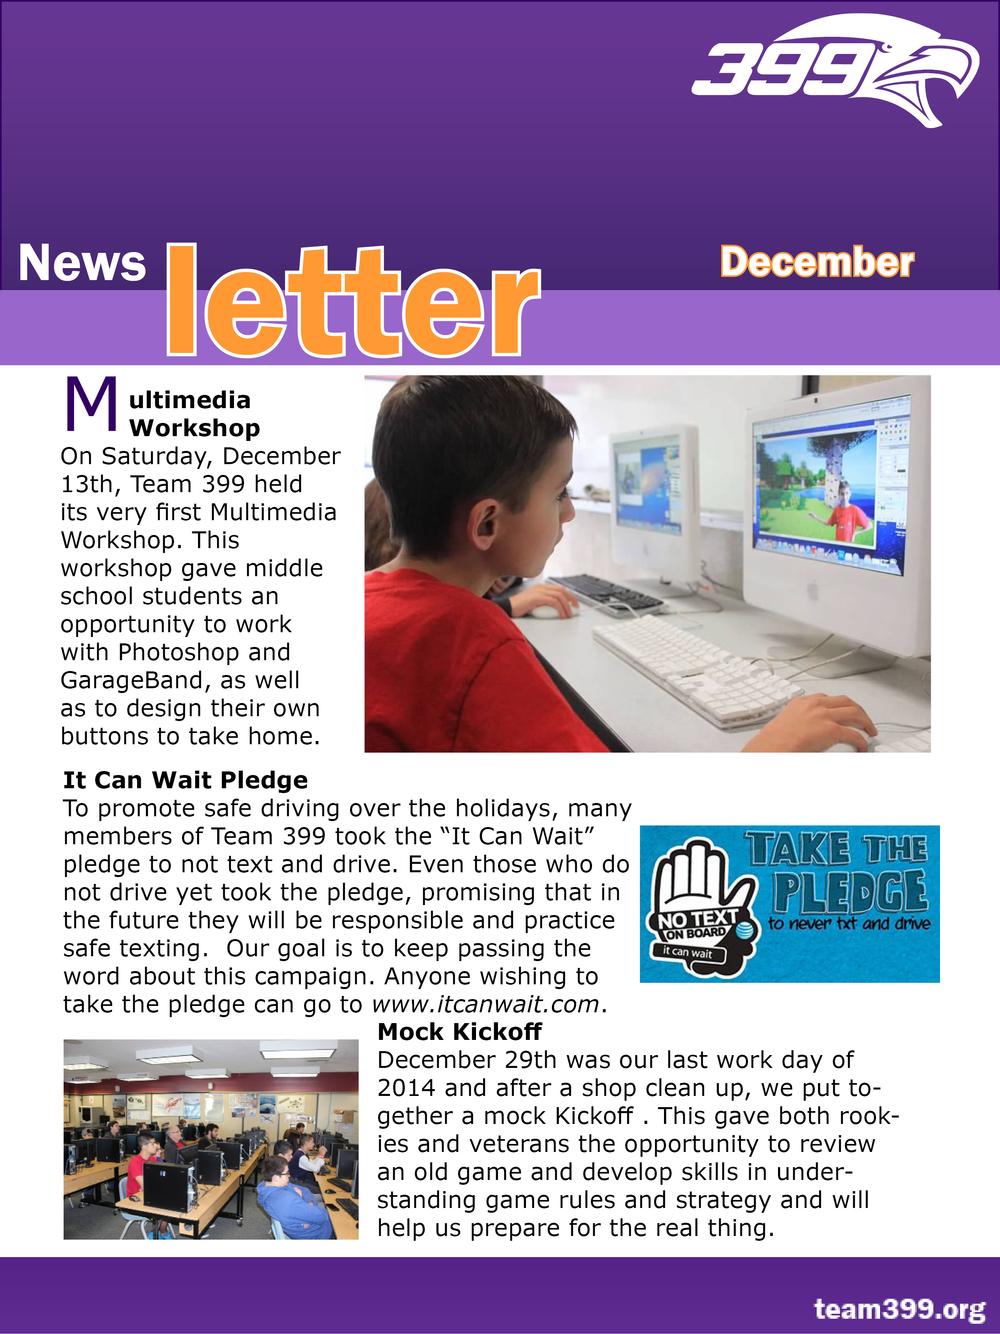 2014 dec newsletter2 - Copy.jpg